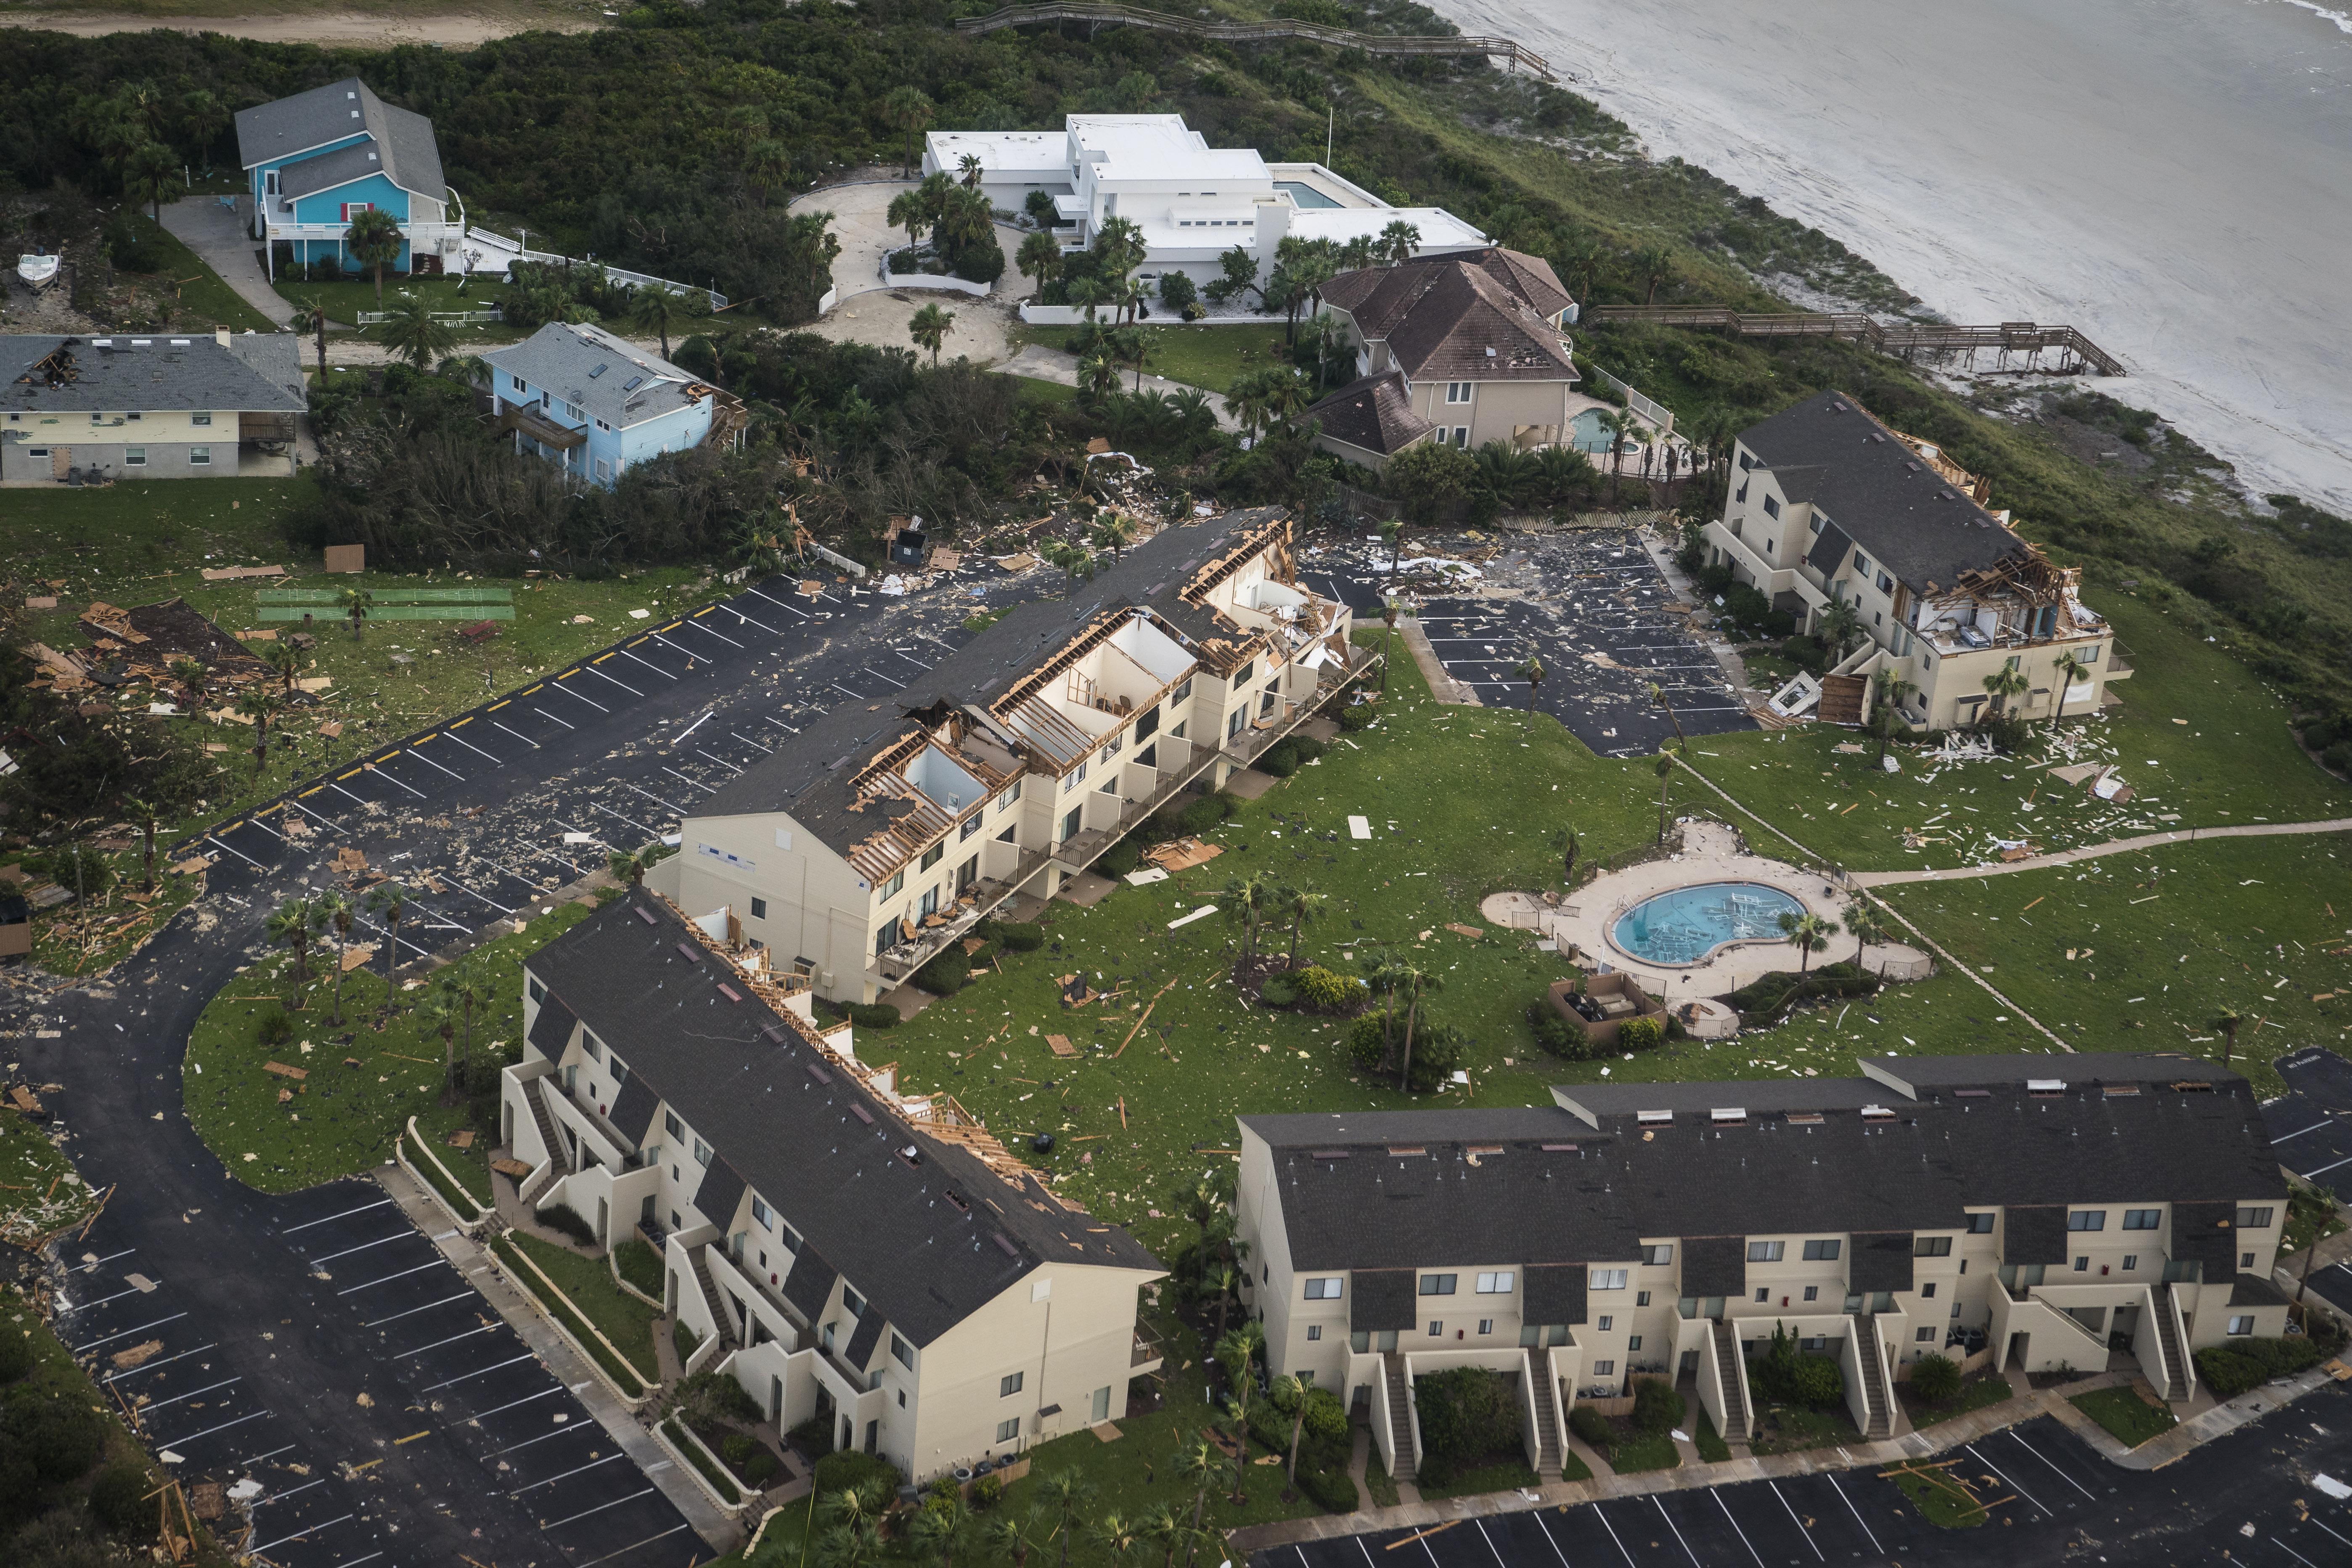 Make Money Insurance Adjuster After Hurricane Irma Harvey Money